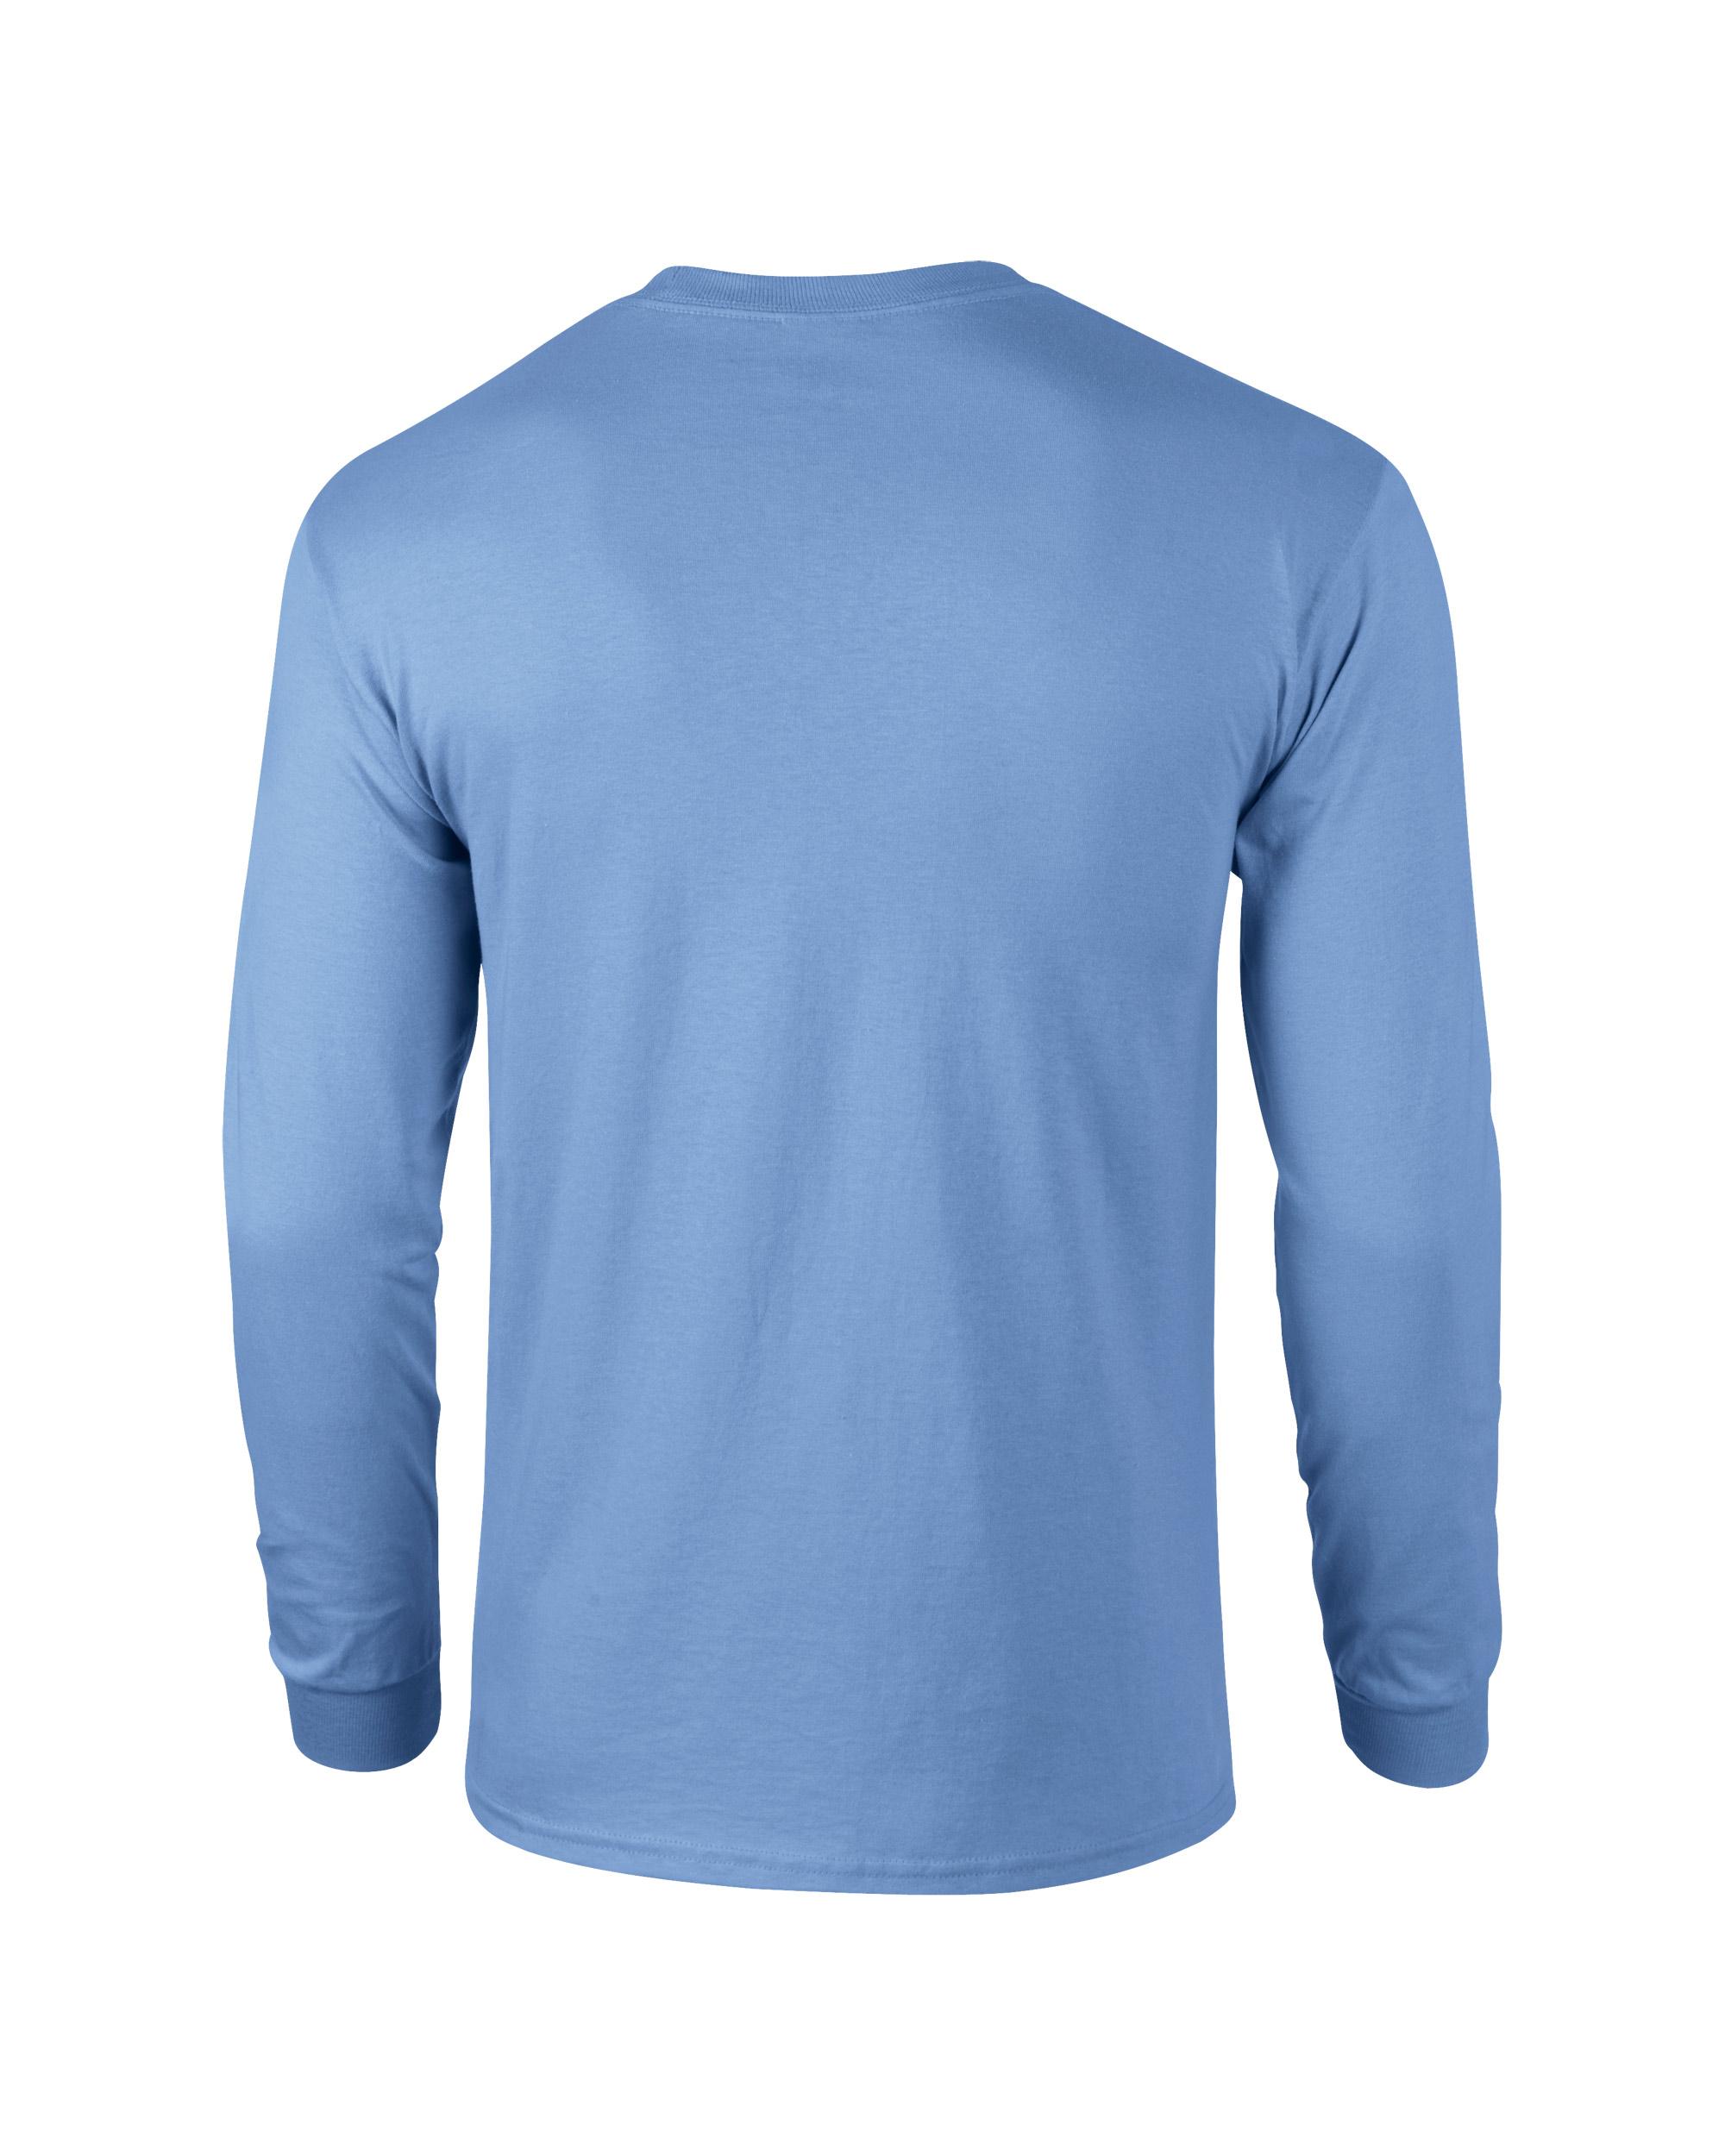 b02f77f22d2 ... Adult Unisex Ultra Cotton Long Sleeve T-Shirt Carolina Blue Back ...